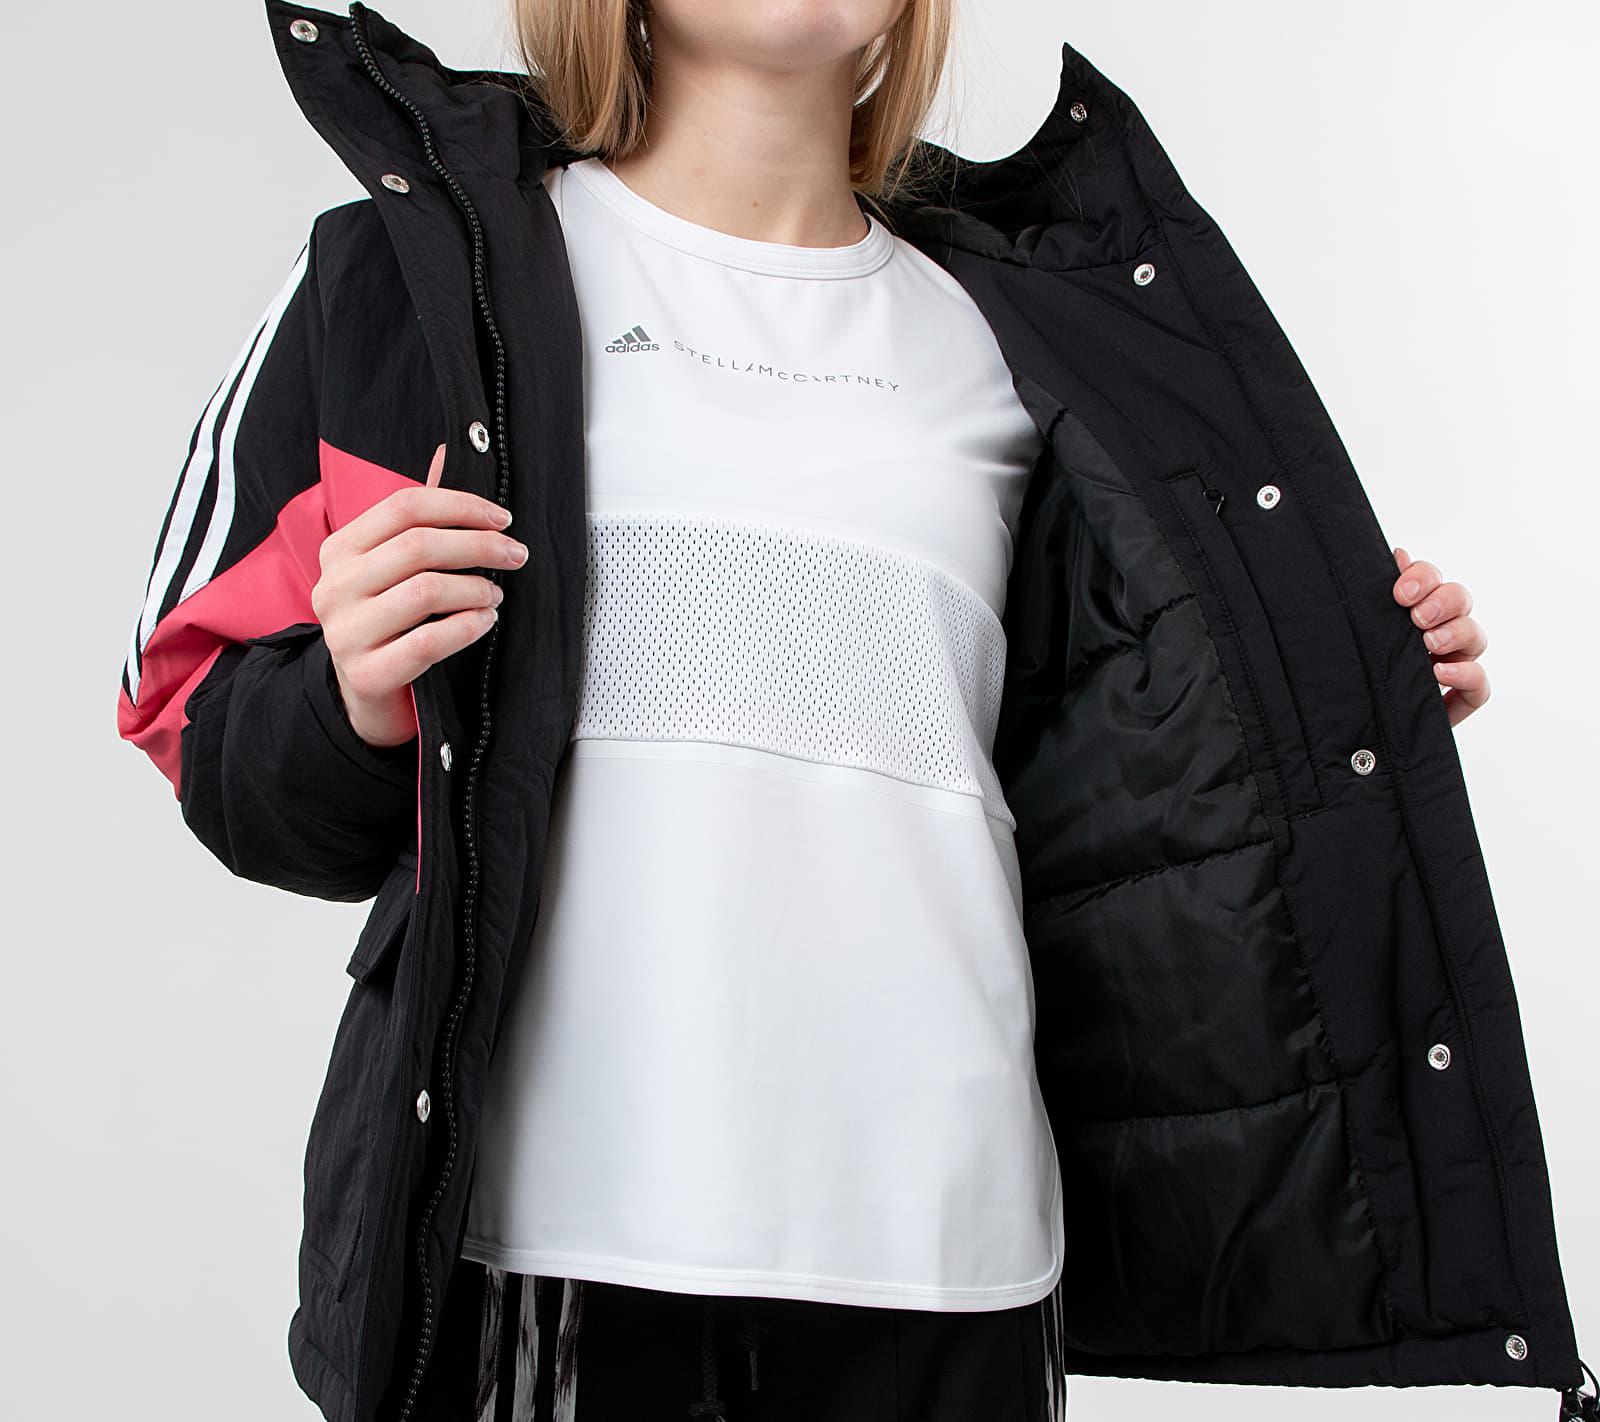 adidas Iconic Winter Jacket Black/ Craft Pink/ White